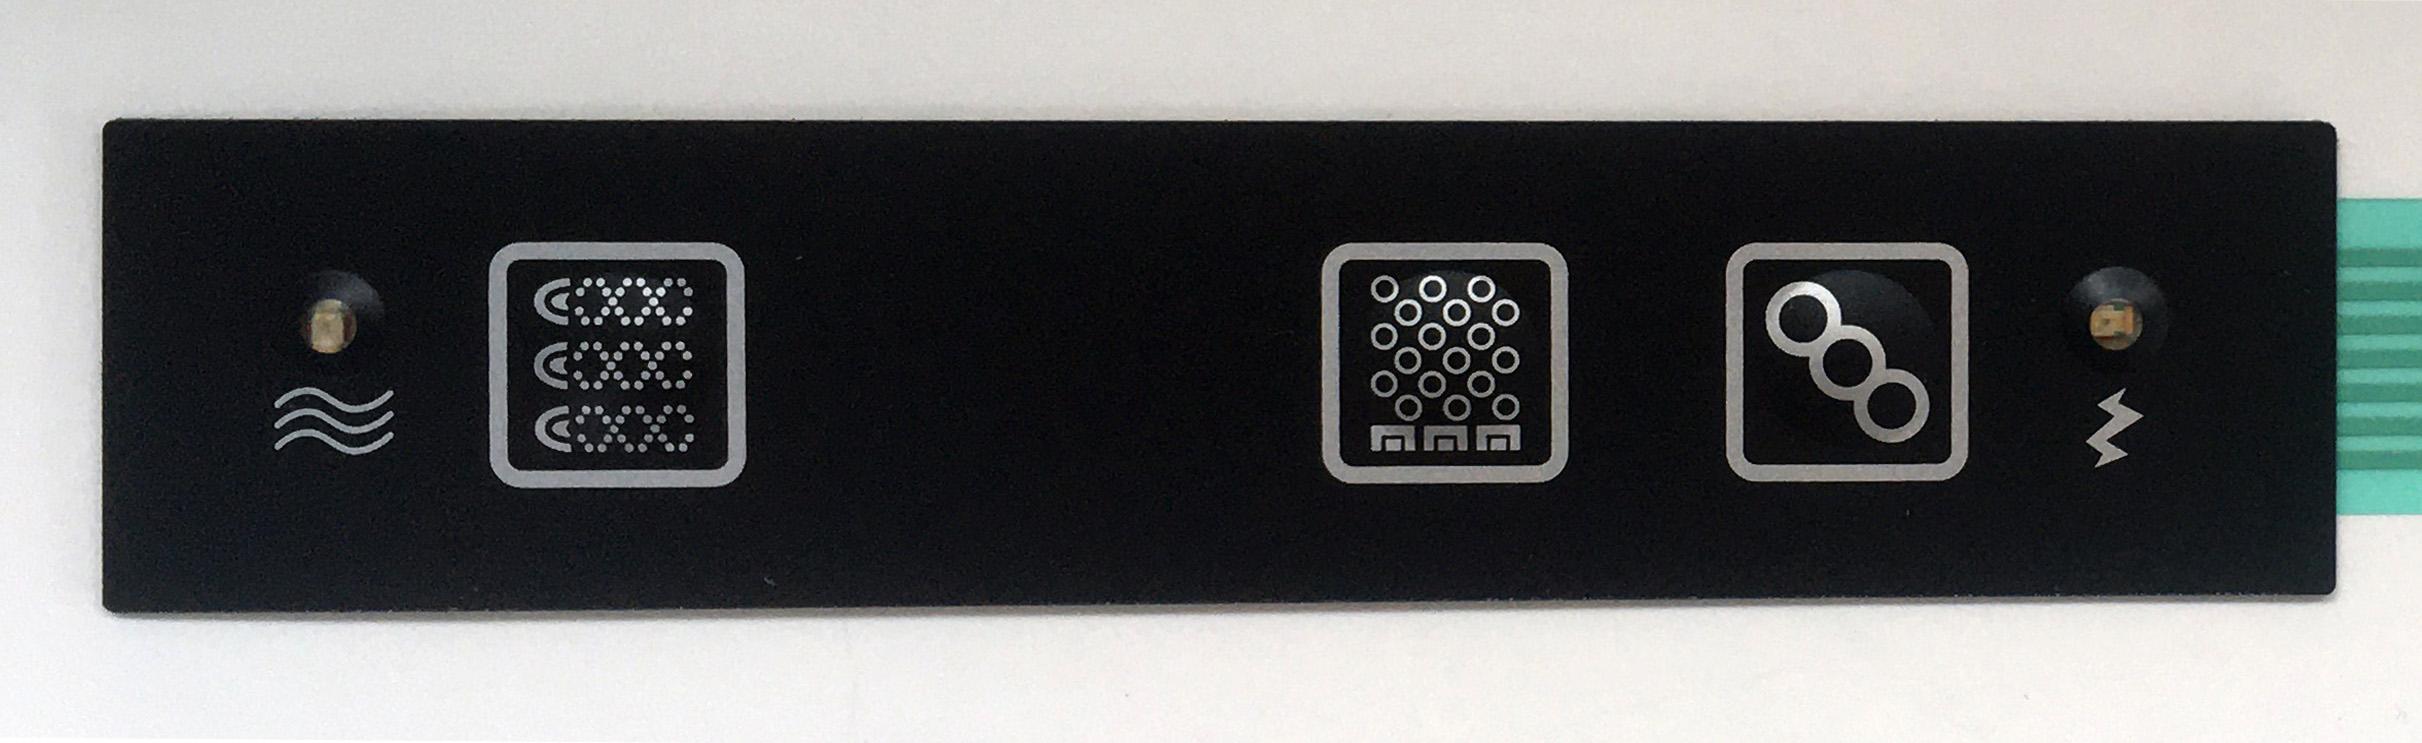 Kit whirlpool, blower e  cromoterapia con tastiera 'Flat'